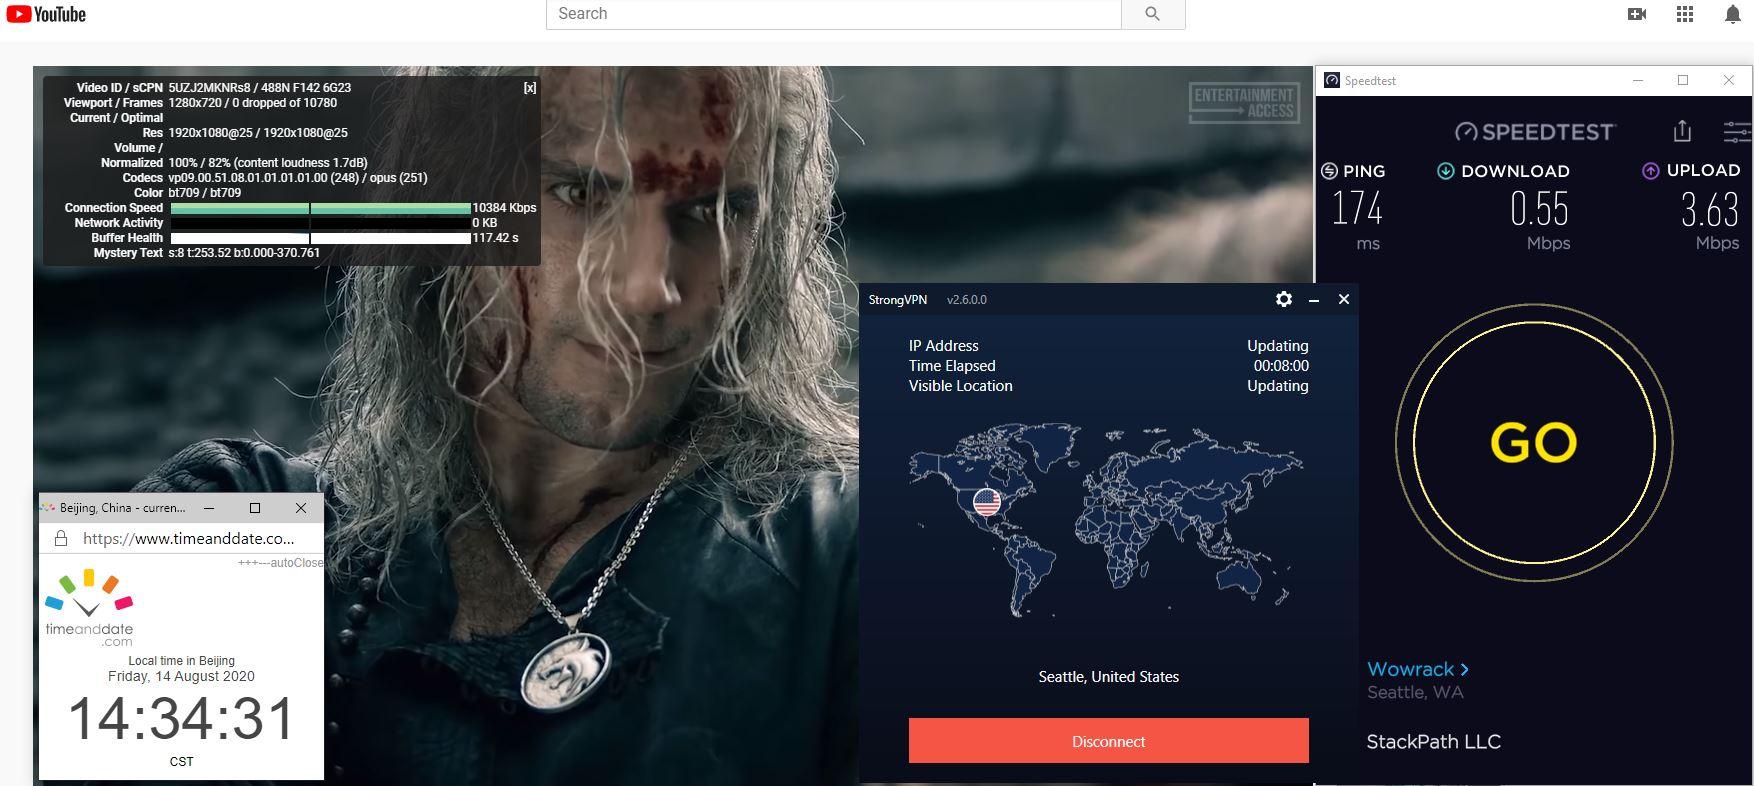 Windows10 StrongVPN IKEv2 USA - Seattle 中国VPN 翻墙 科学上网 翻墙速度测试 - 20200814